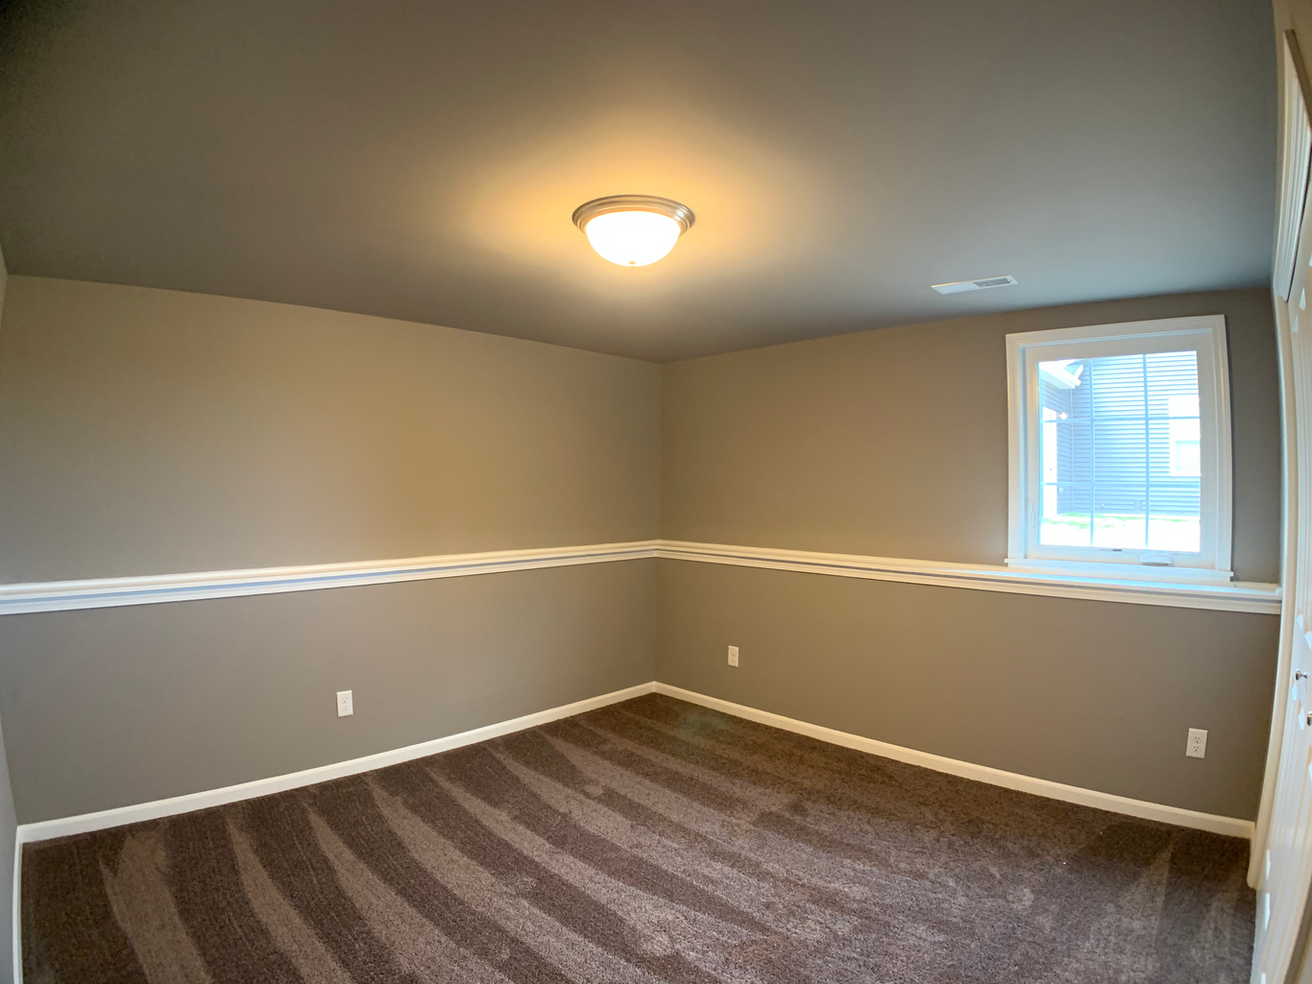 Revere Finished Lower Level Bedroom 1.pn